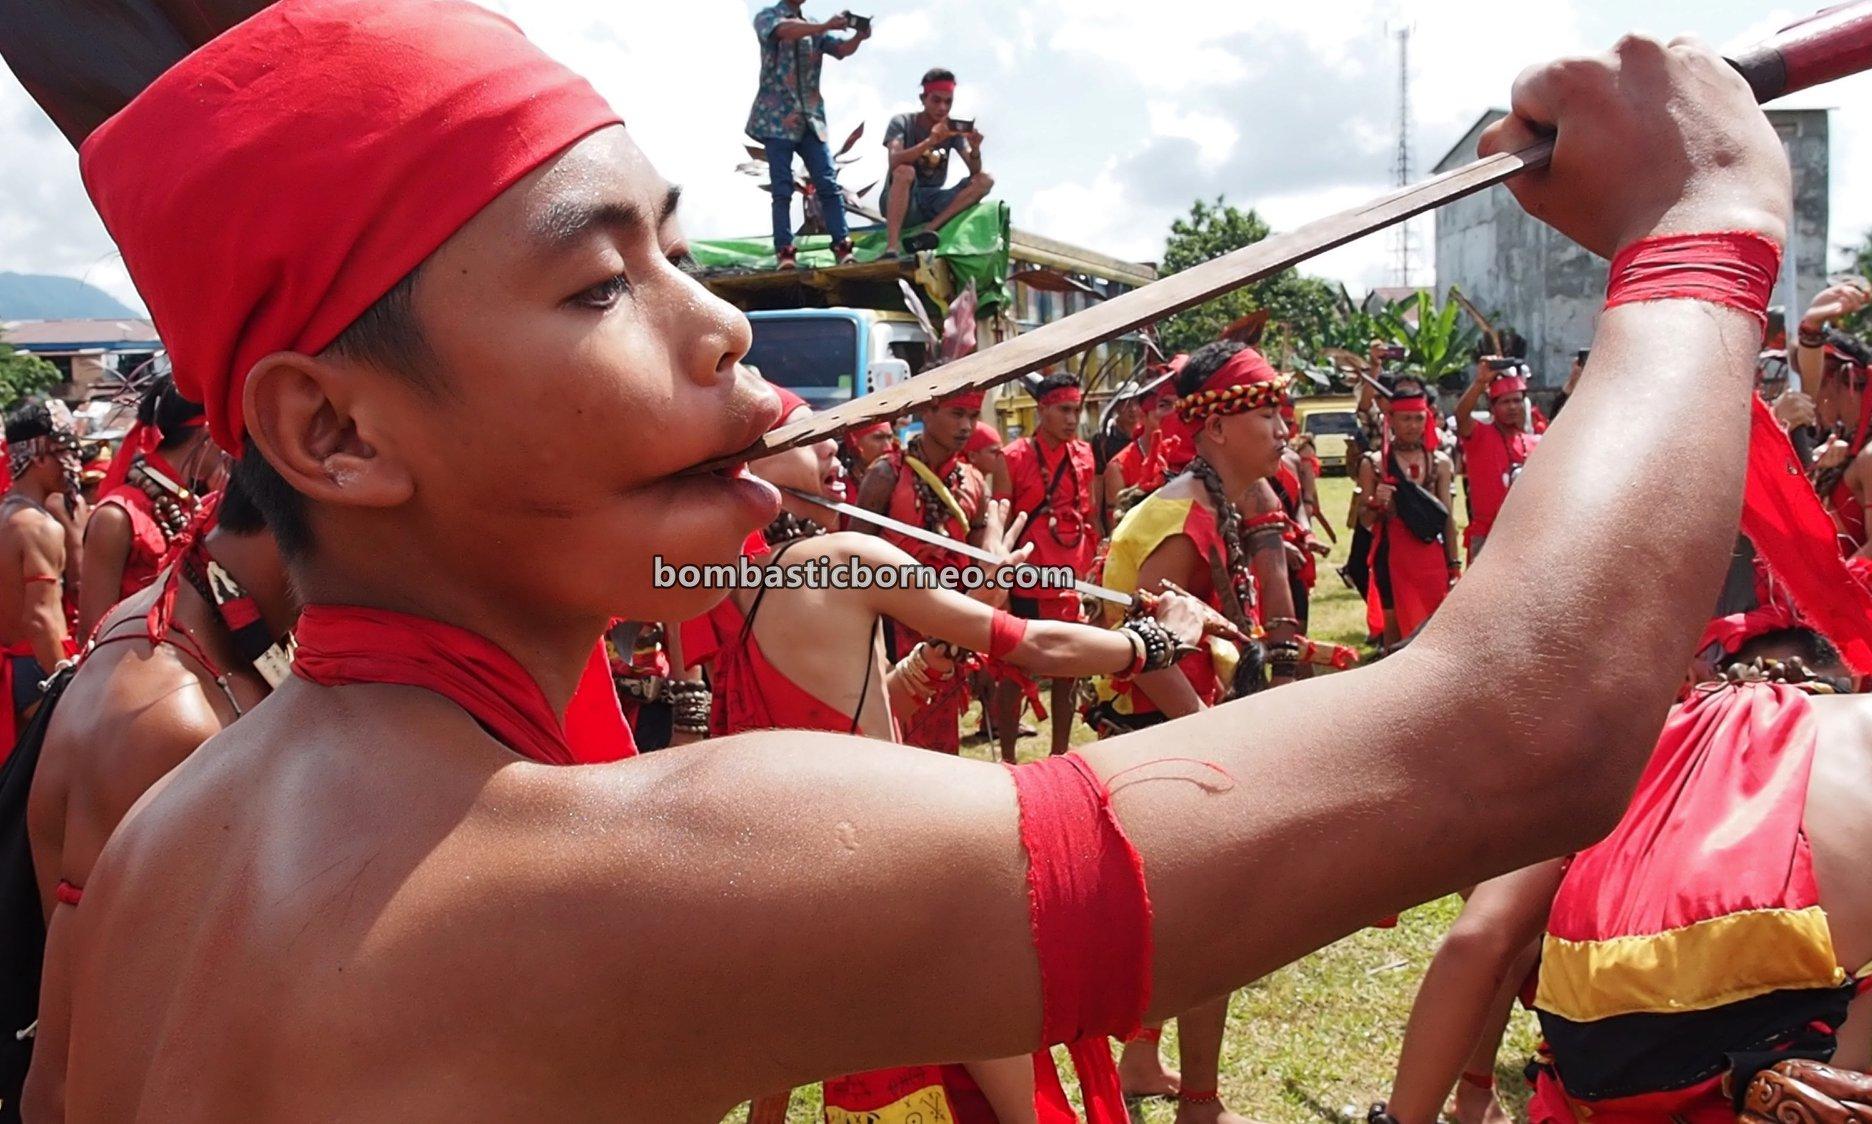 Festival Budaya Dayak, authentic, indigenous, traditional, culture, event, native, tribal, Indonesia, destination, Obyek wisata, Tourism, 印尼西加里曼丹, 婆罗洲达雅文化, 孟加映土著部落